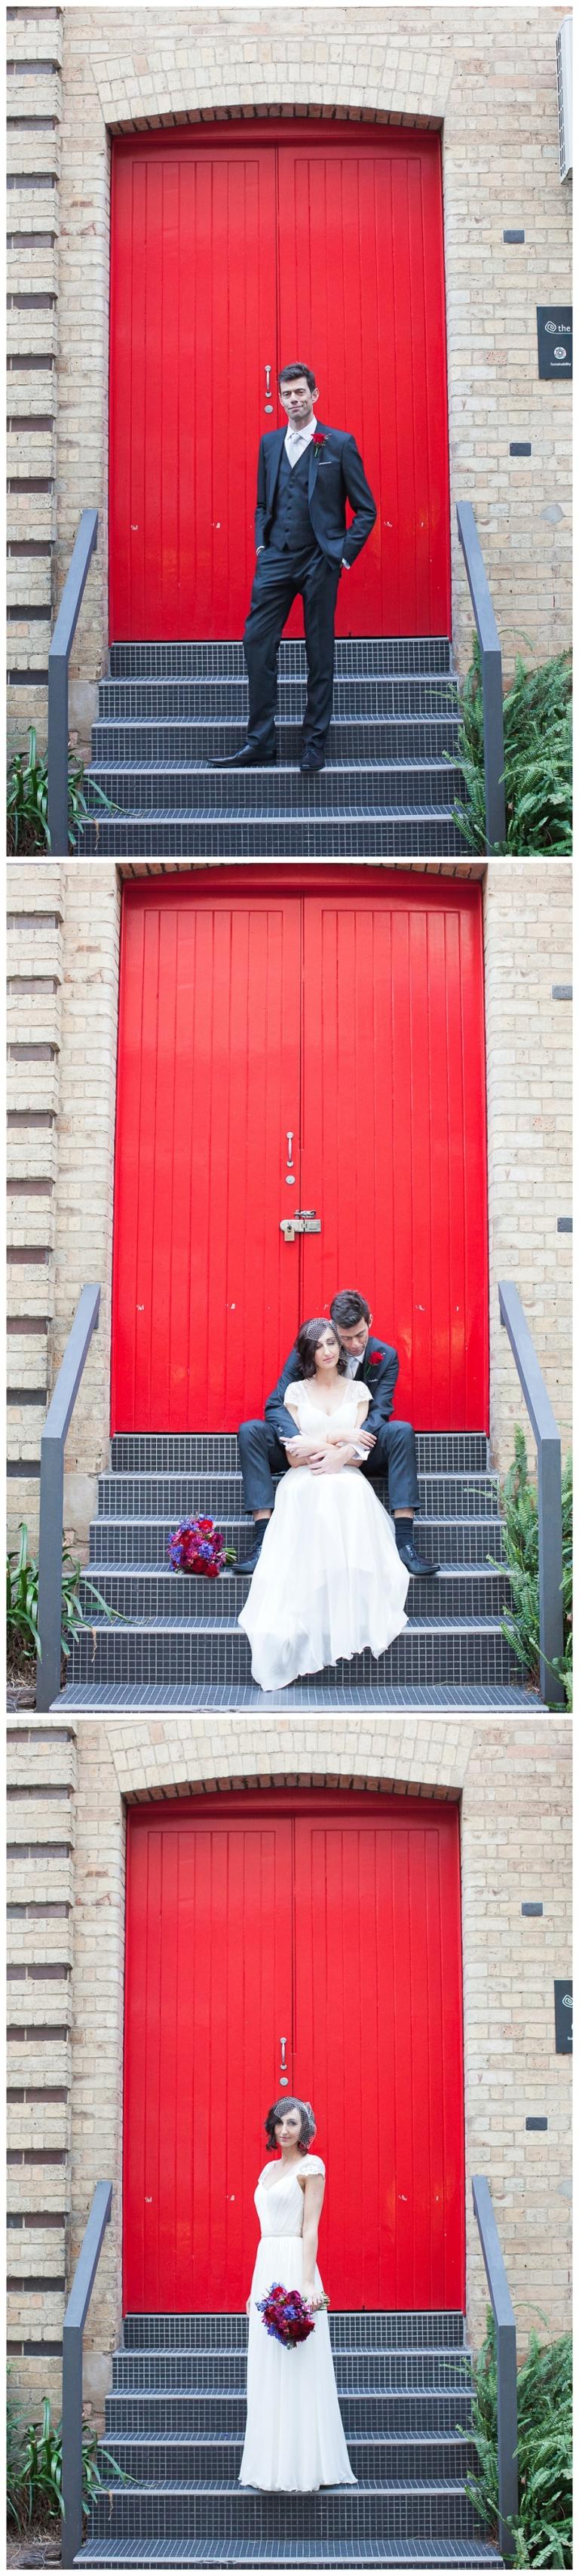 weddingphotosatbrisbanepowerhouse-kellyadamsphotography035